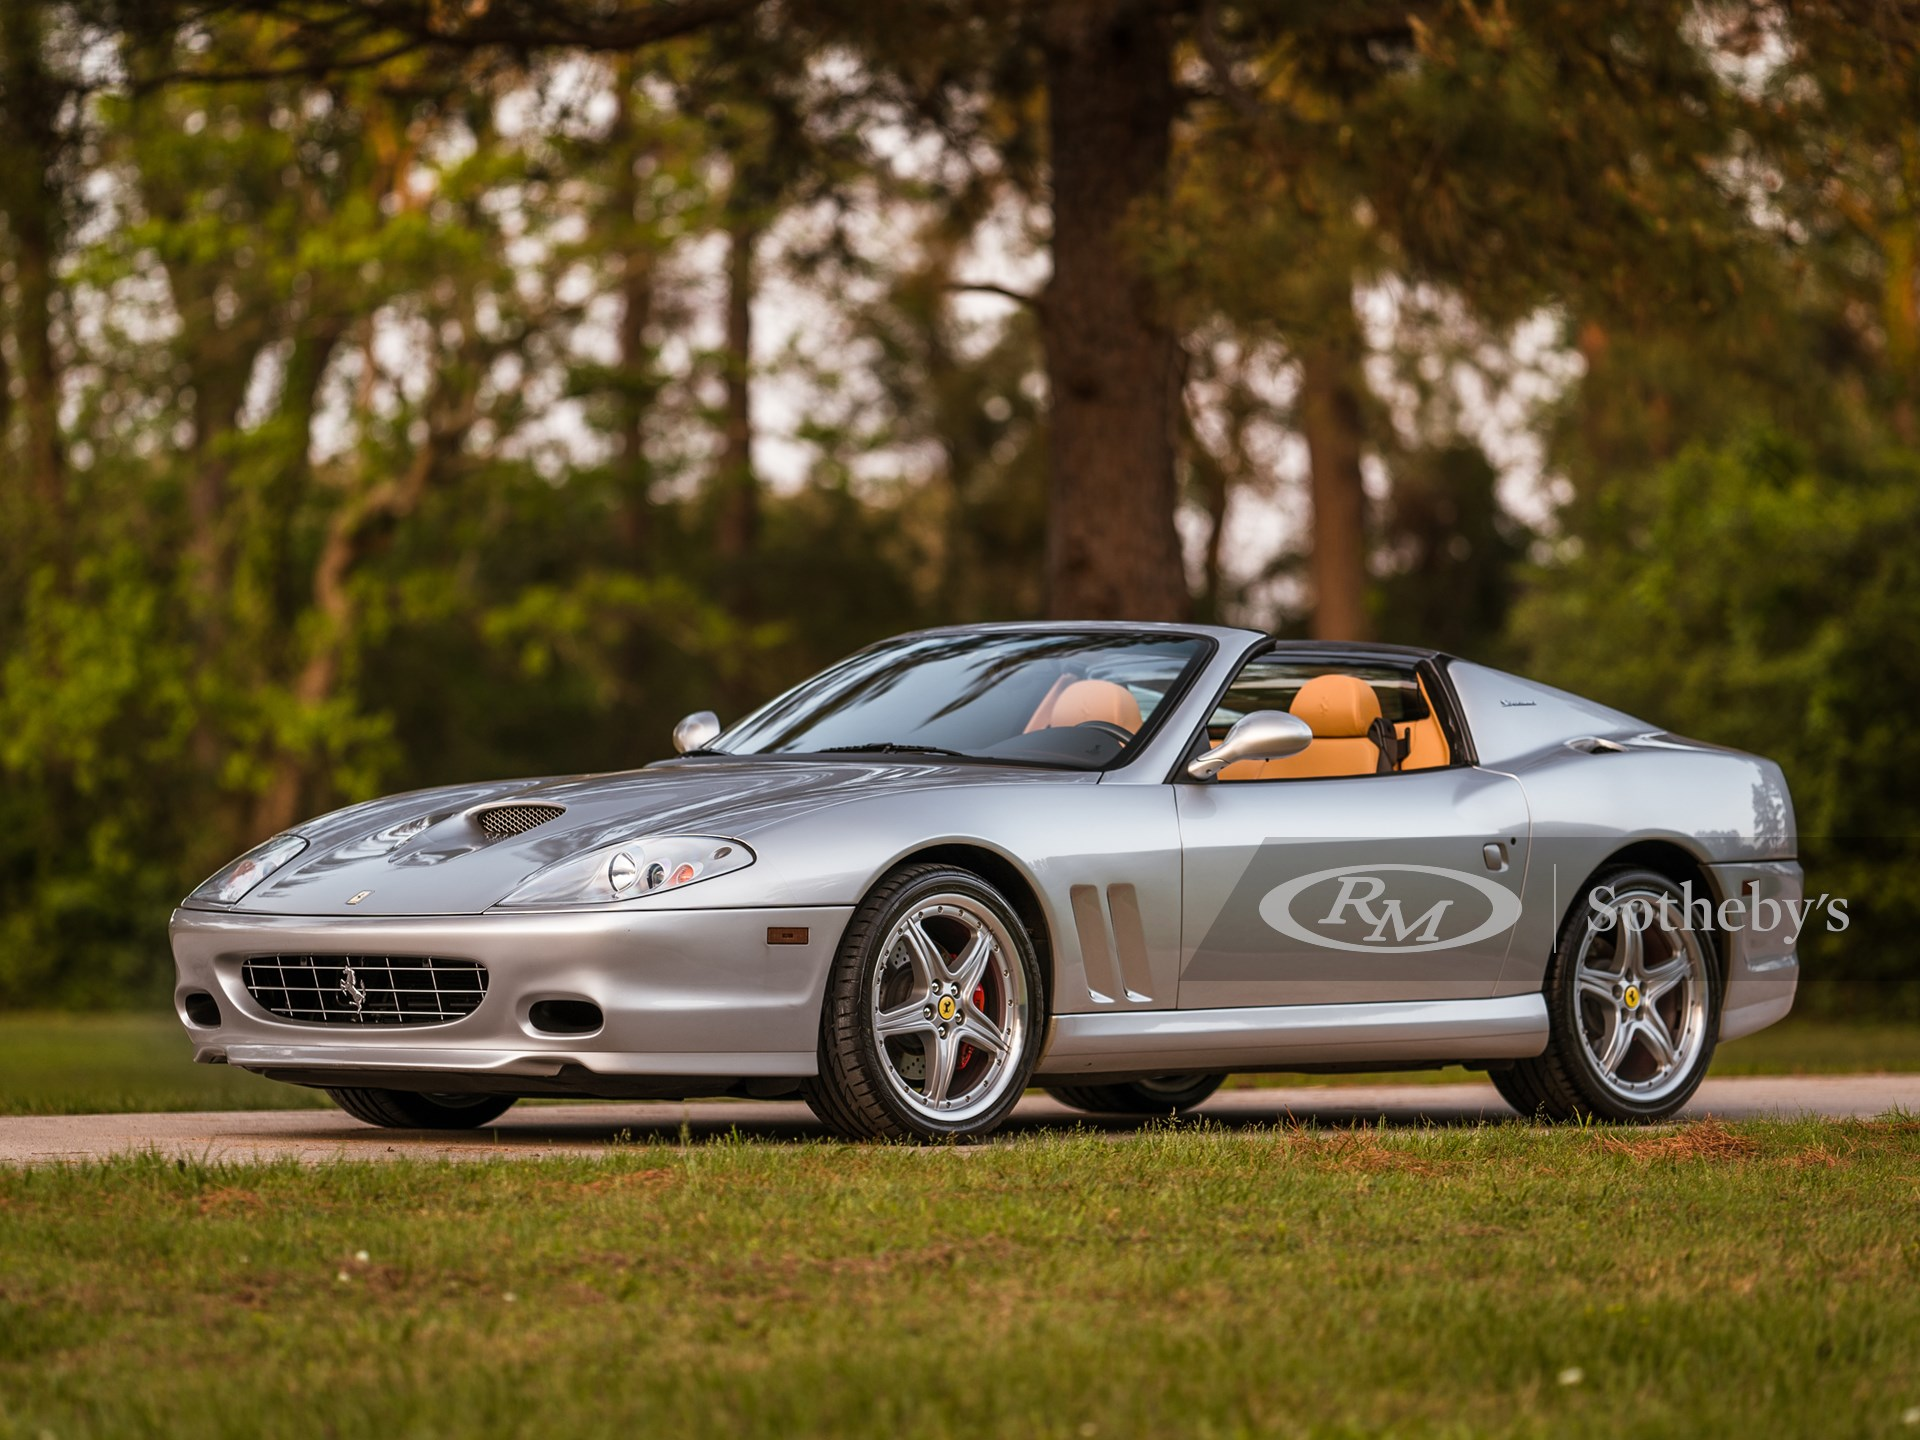 210427 RM Sotheby's Amelia Island Auction - 2005 Ferrari Superamerica